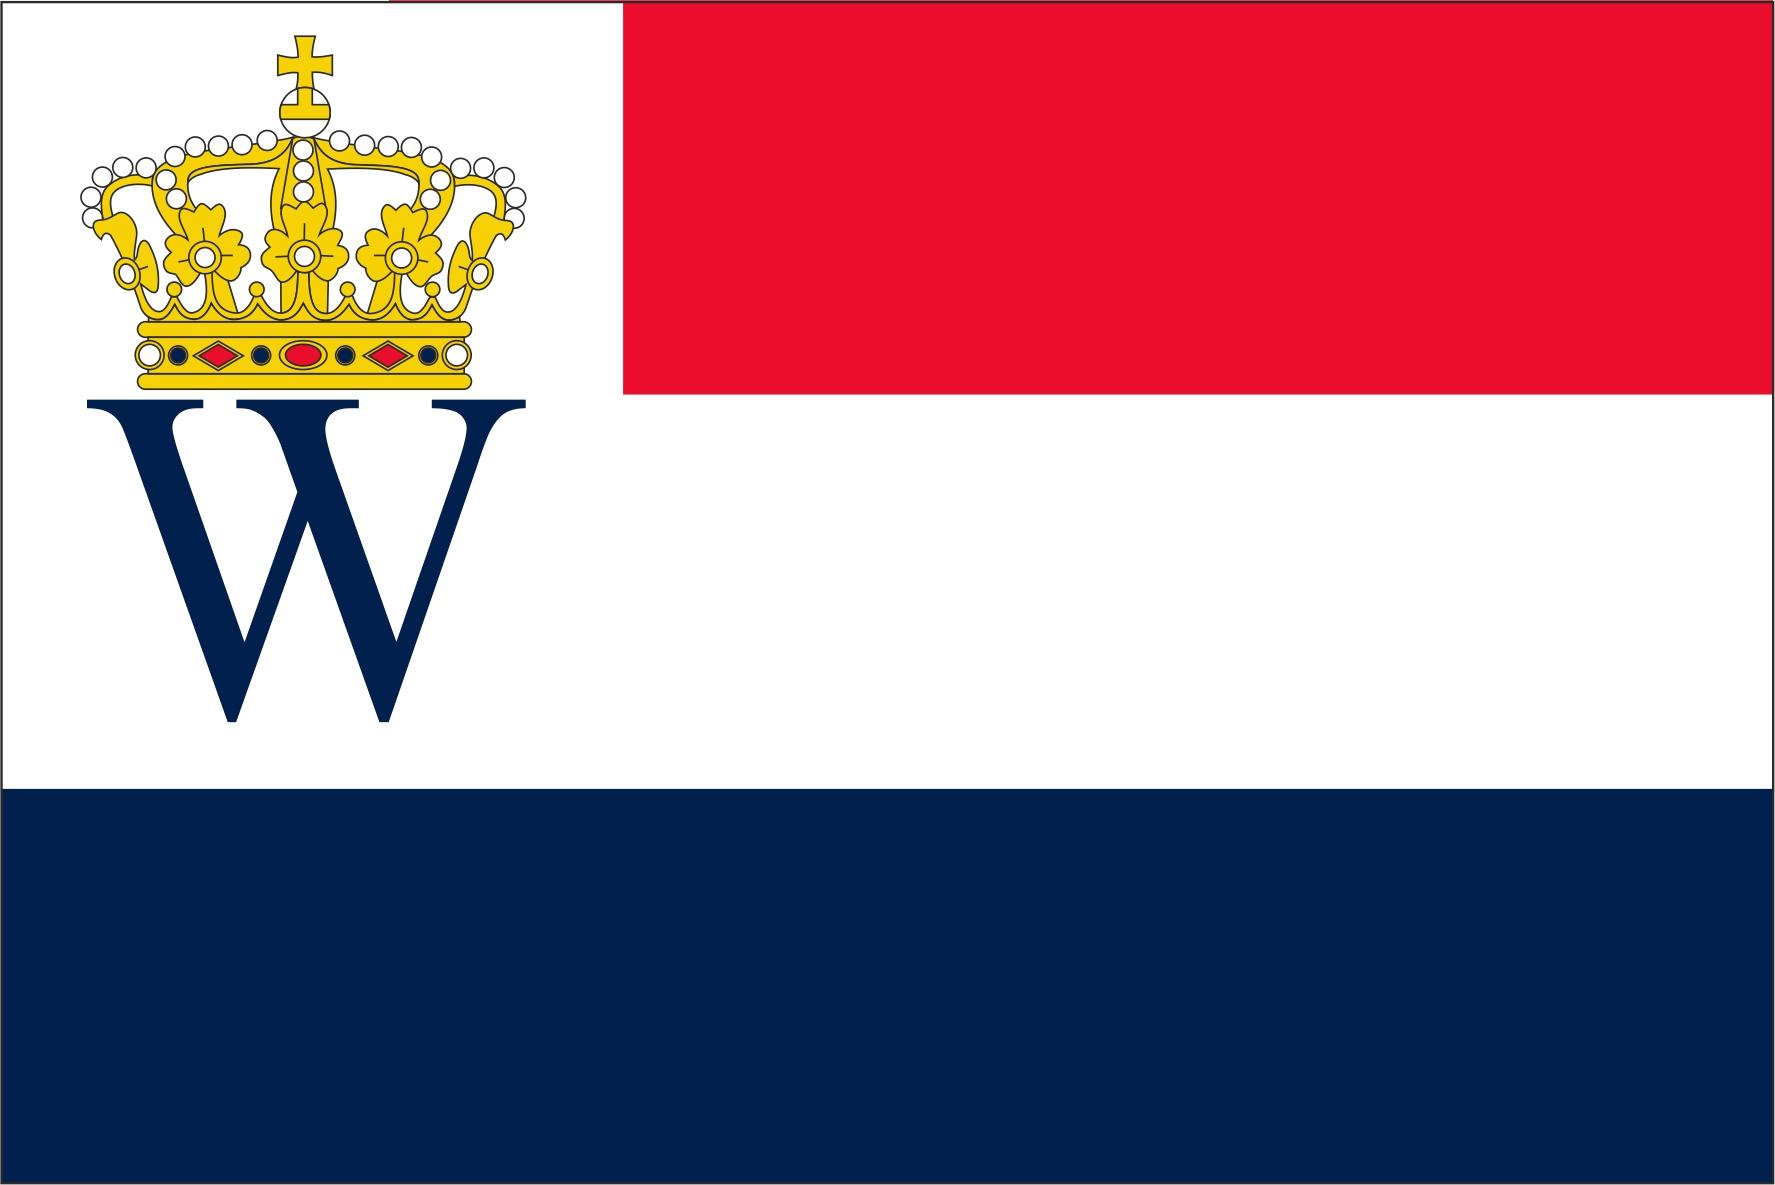 Koninklijke Watersport Vlag 80x120cm Oud Hollands